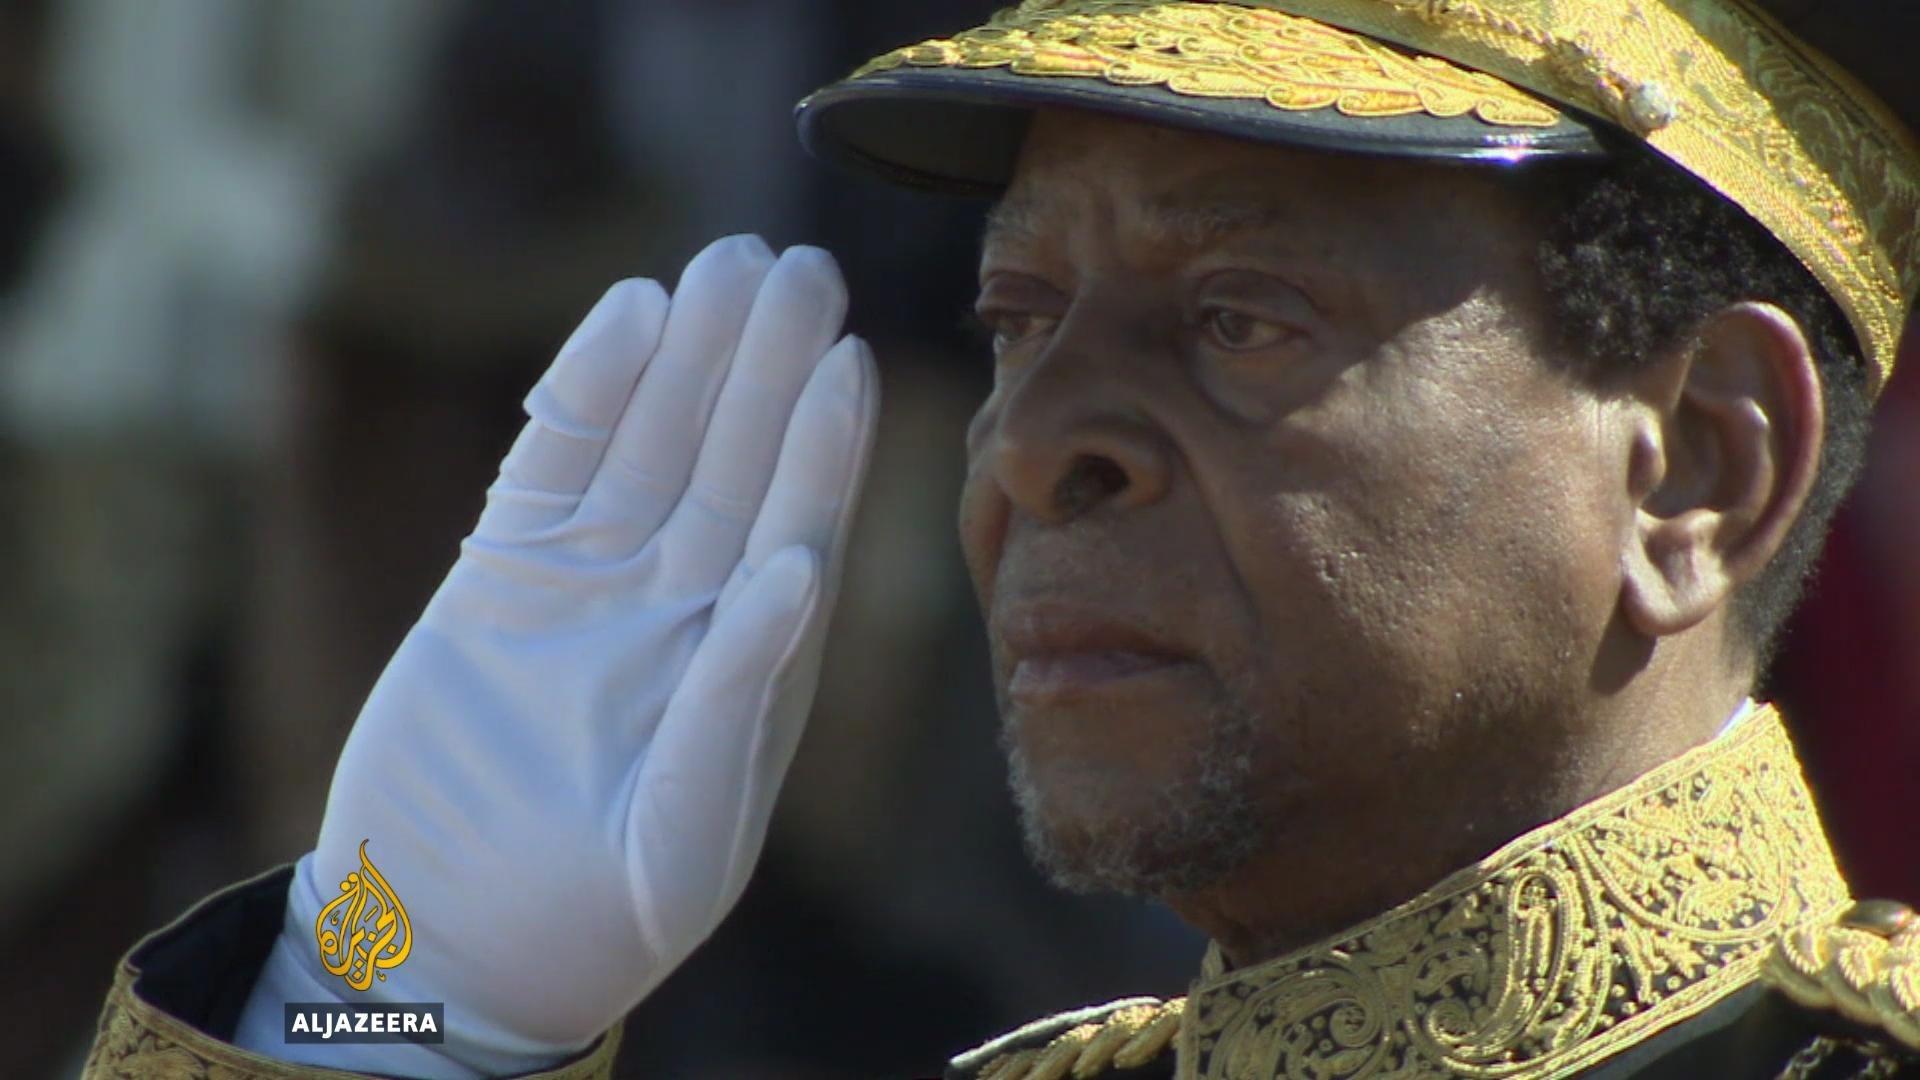 South Africa's Zulu King celebrates birthday